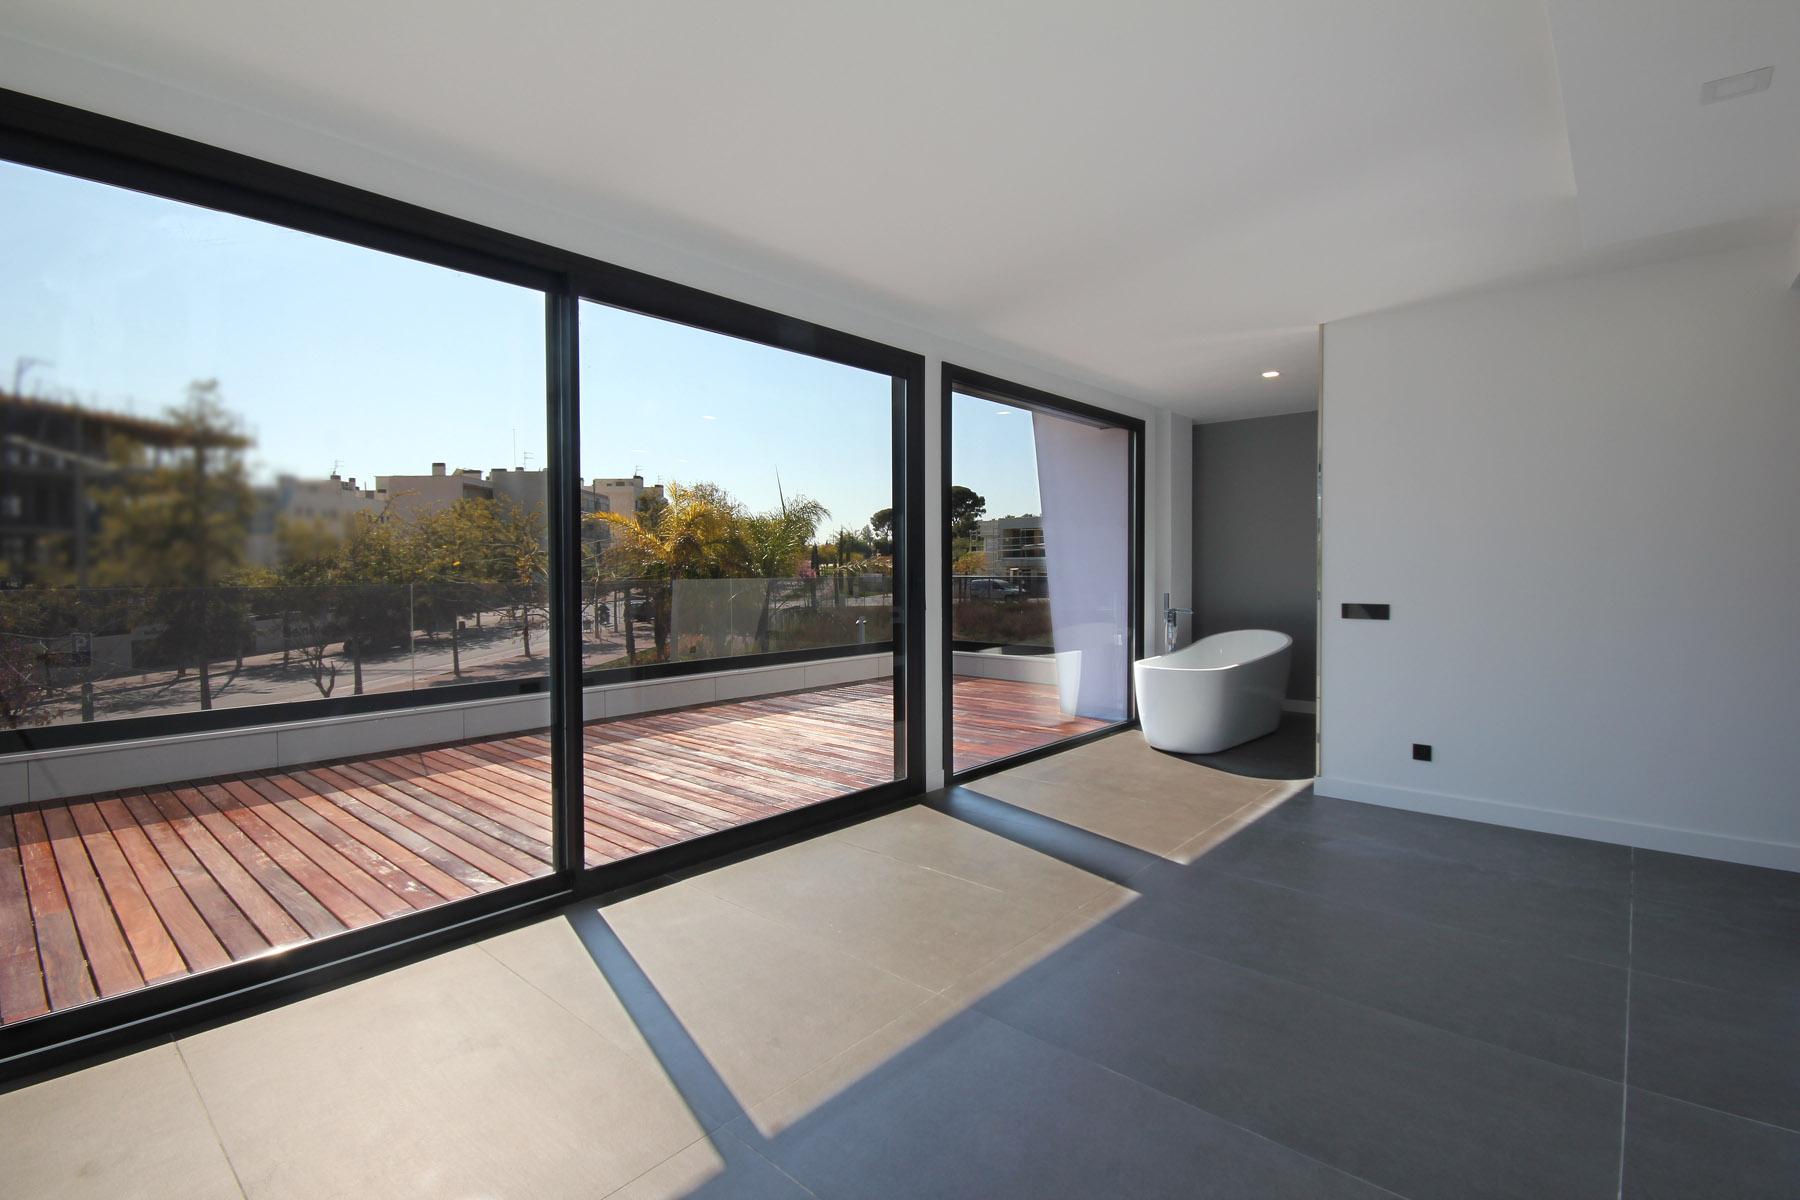 Vivienda-unifamiliar-aislada-en-la-plana-de-sitges-barcelona-12